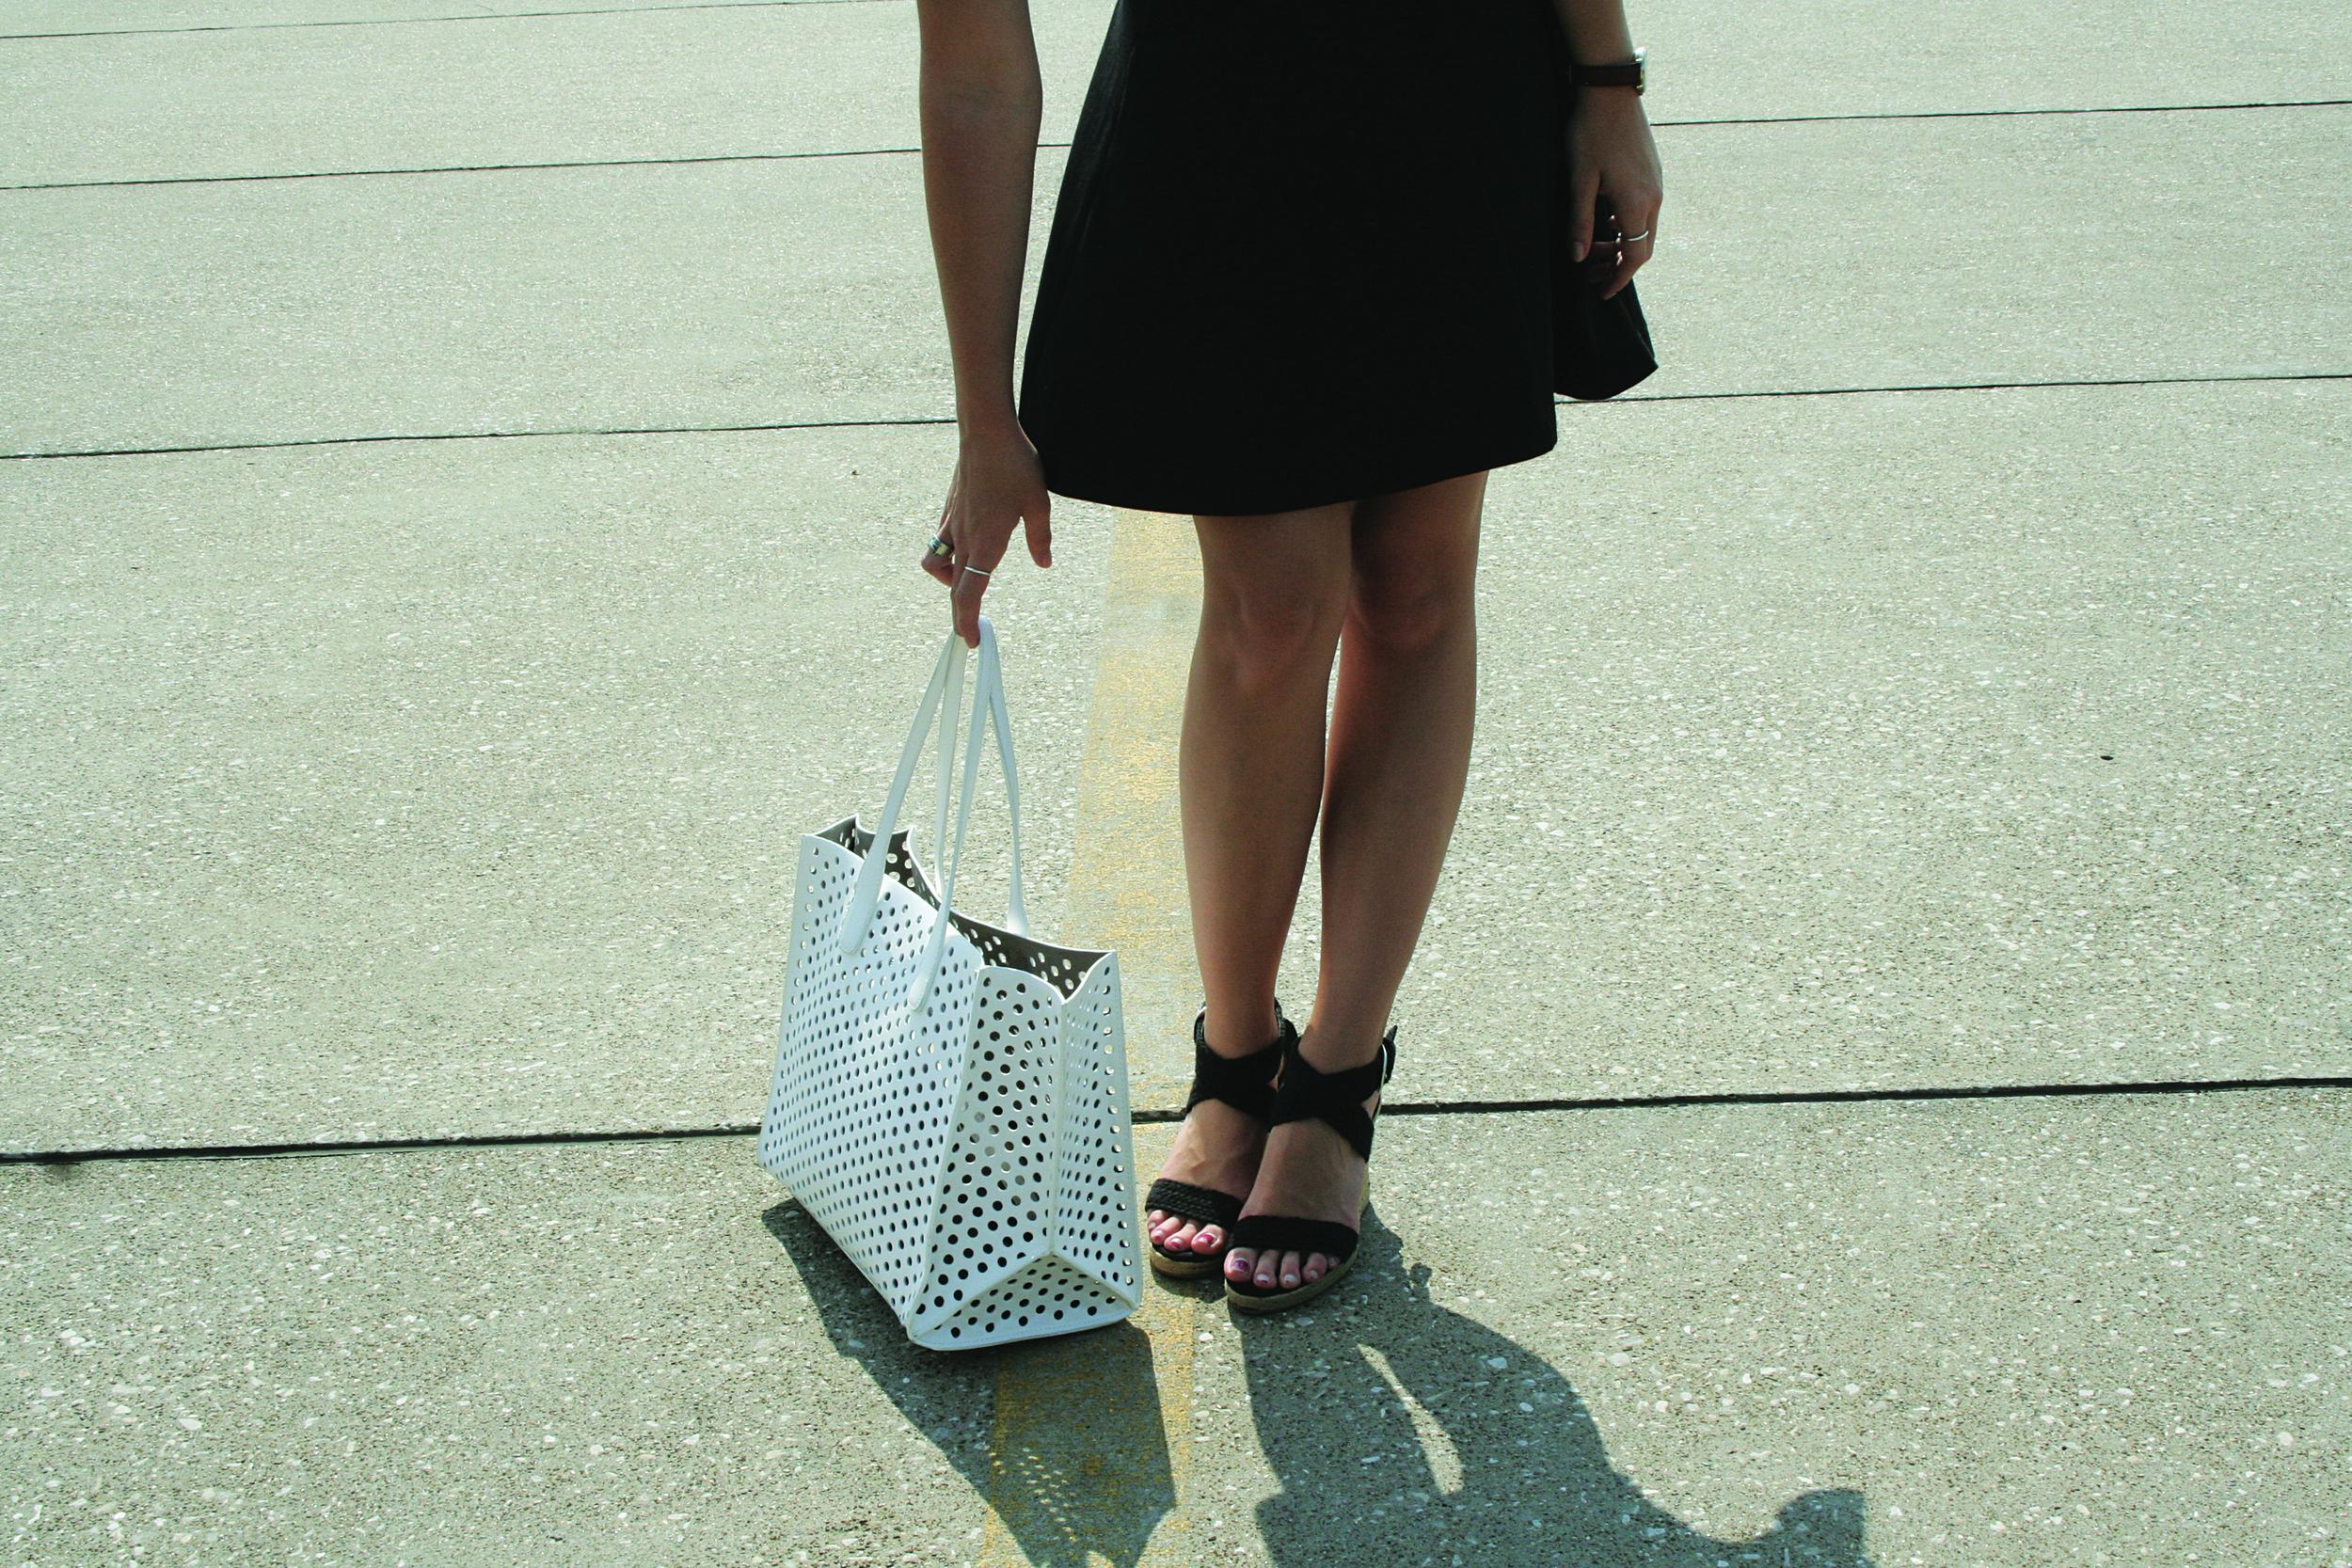 photo: Kierstin | skirt: Uniqlo, shoes: Target, bag: Zara